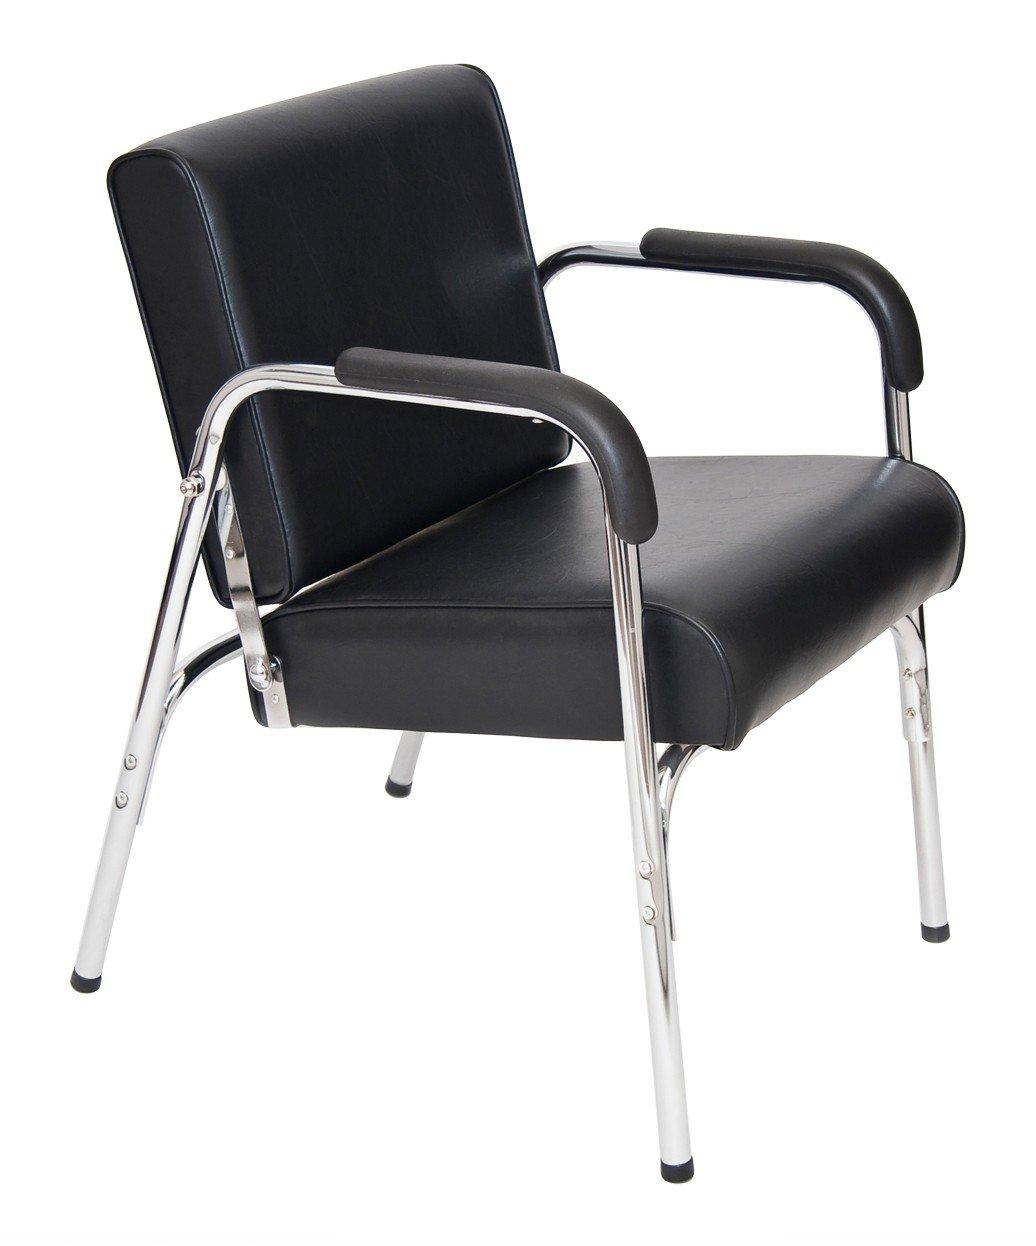 BR Beauty Kate Professional Salon & Barber Auto Recline Shampoo Chair